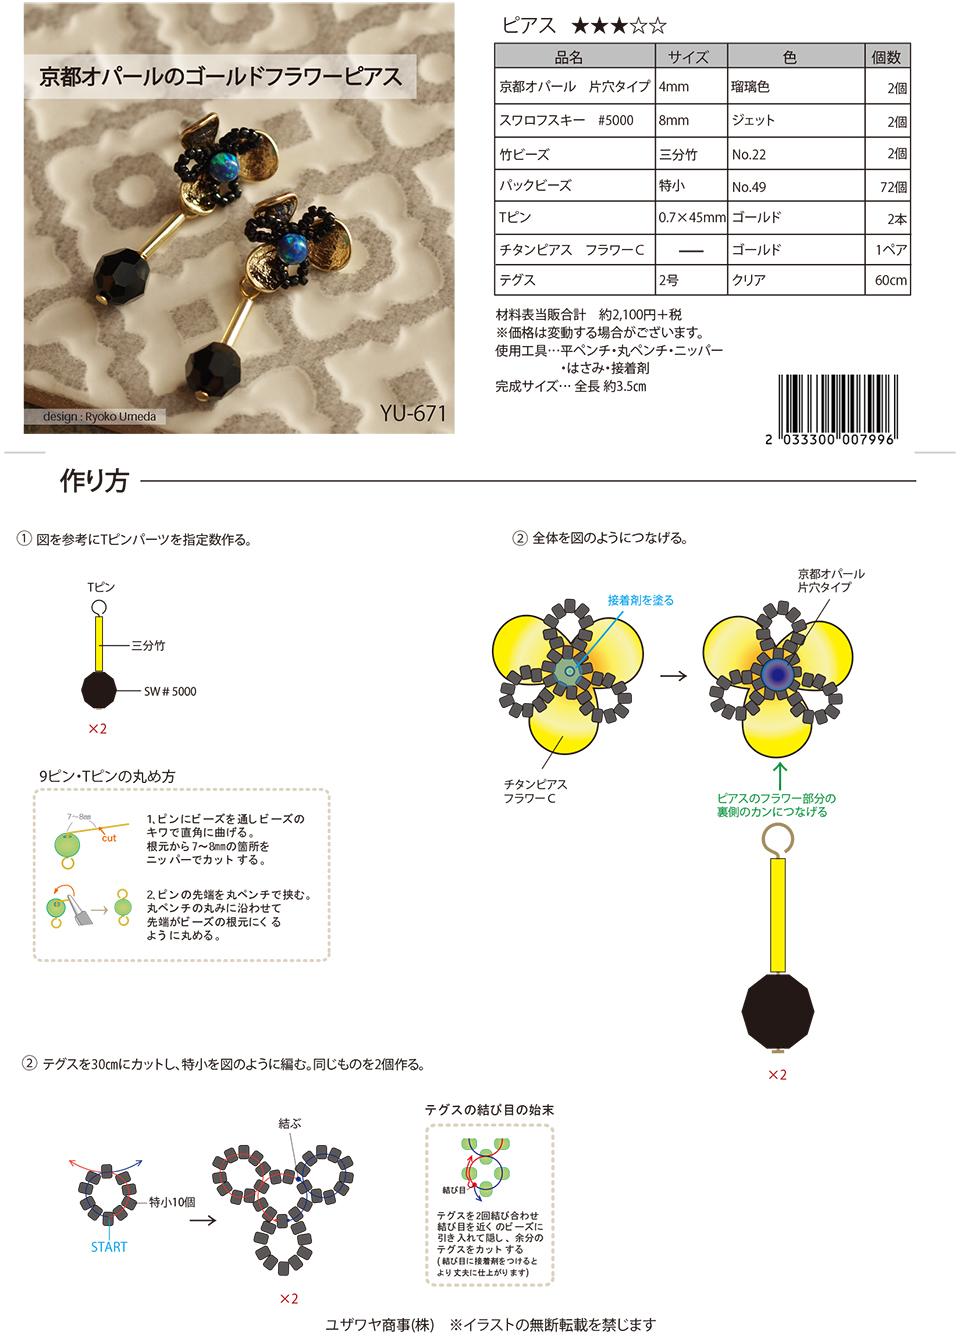 YU-671京都オパールのゴールドフラワーピアス_1.jpg